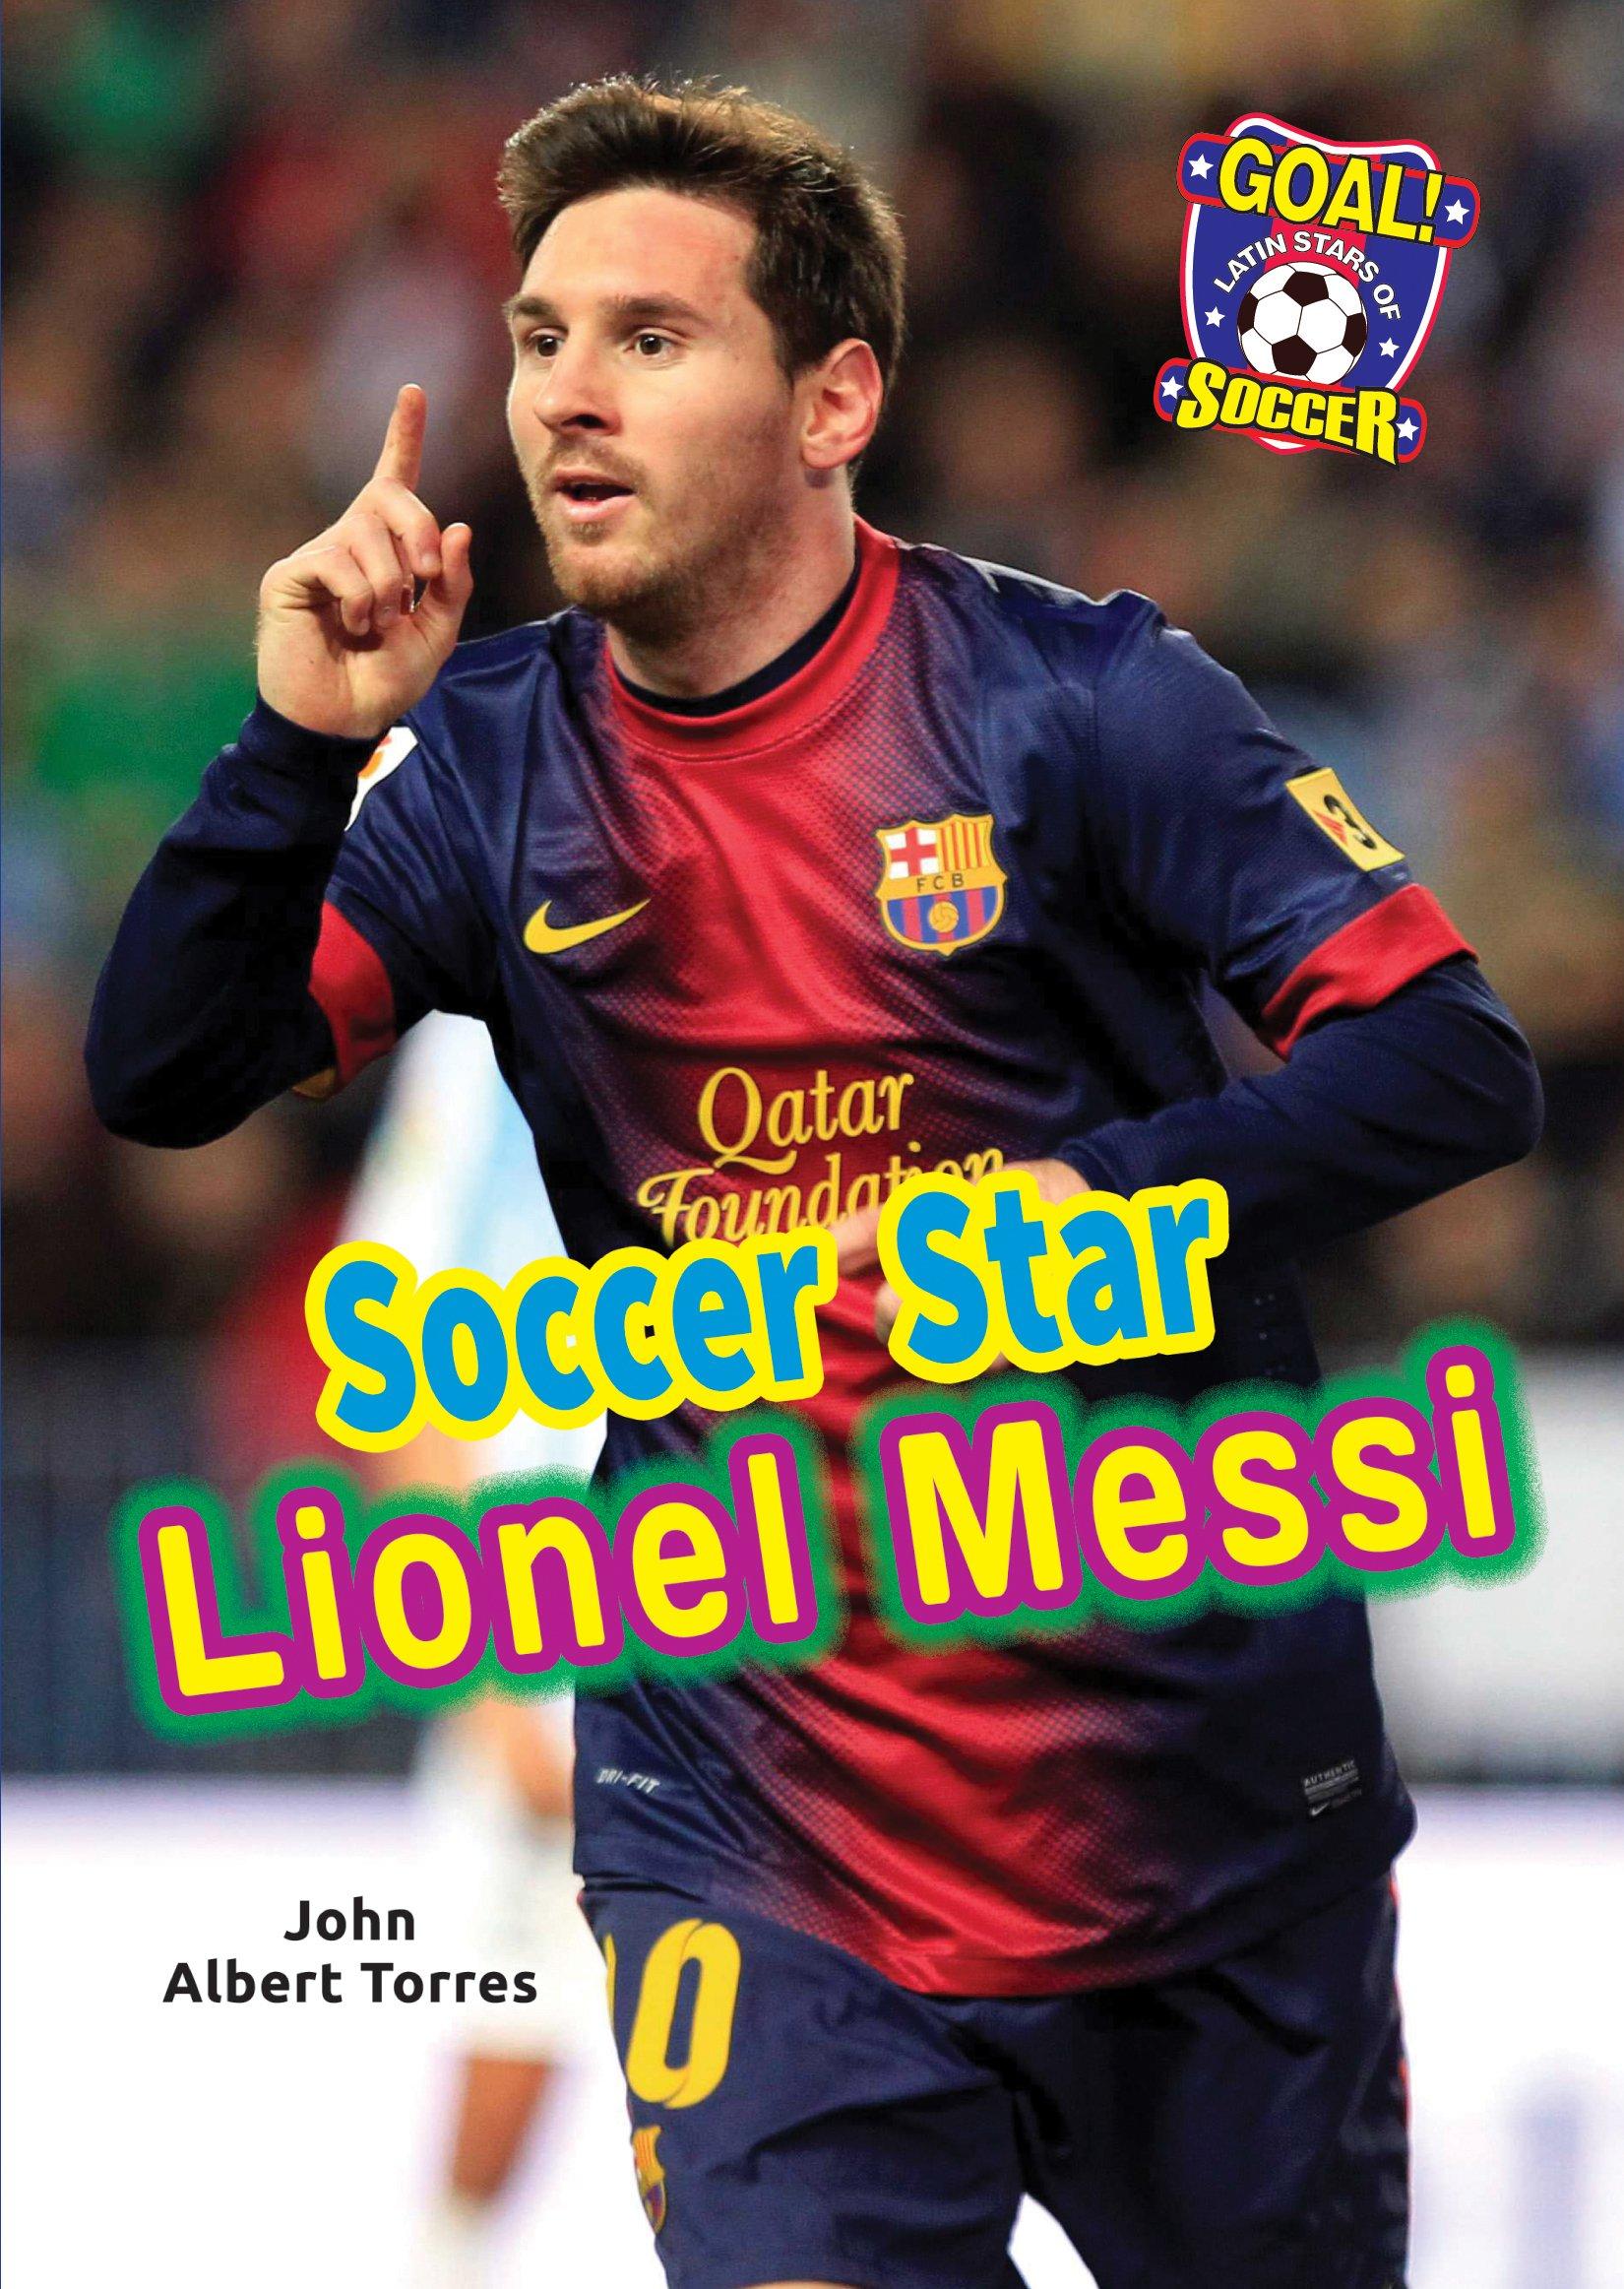 Download Soccer Star Lionel Messi (Goal! Latin Stars of Soccer) pdf epub